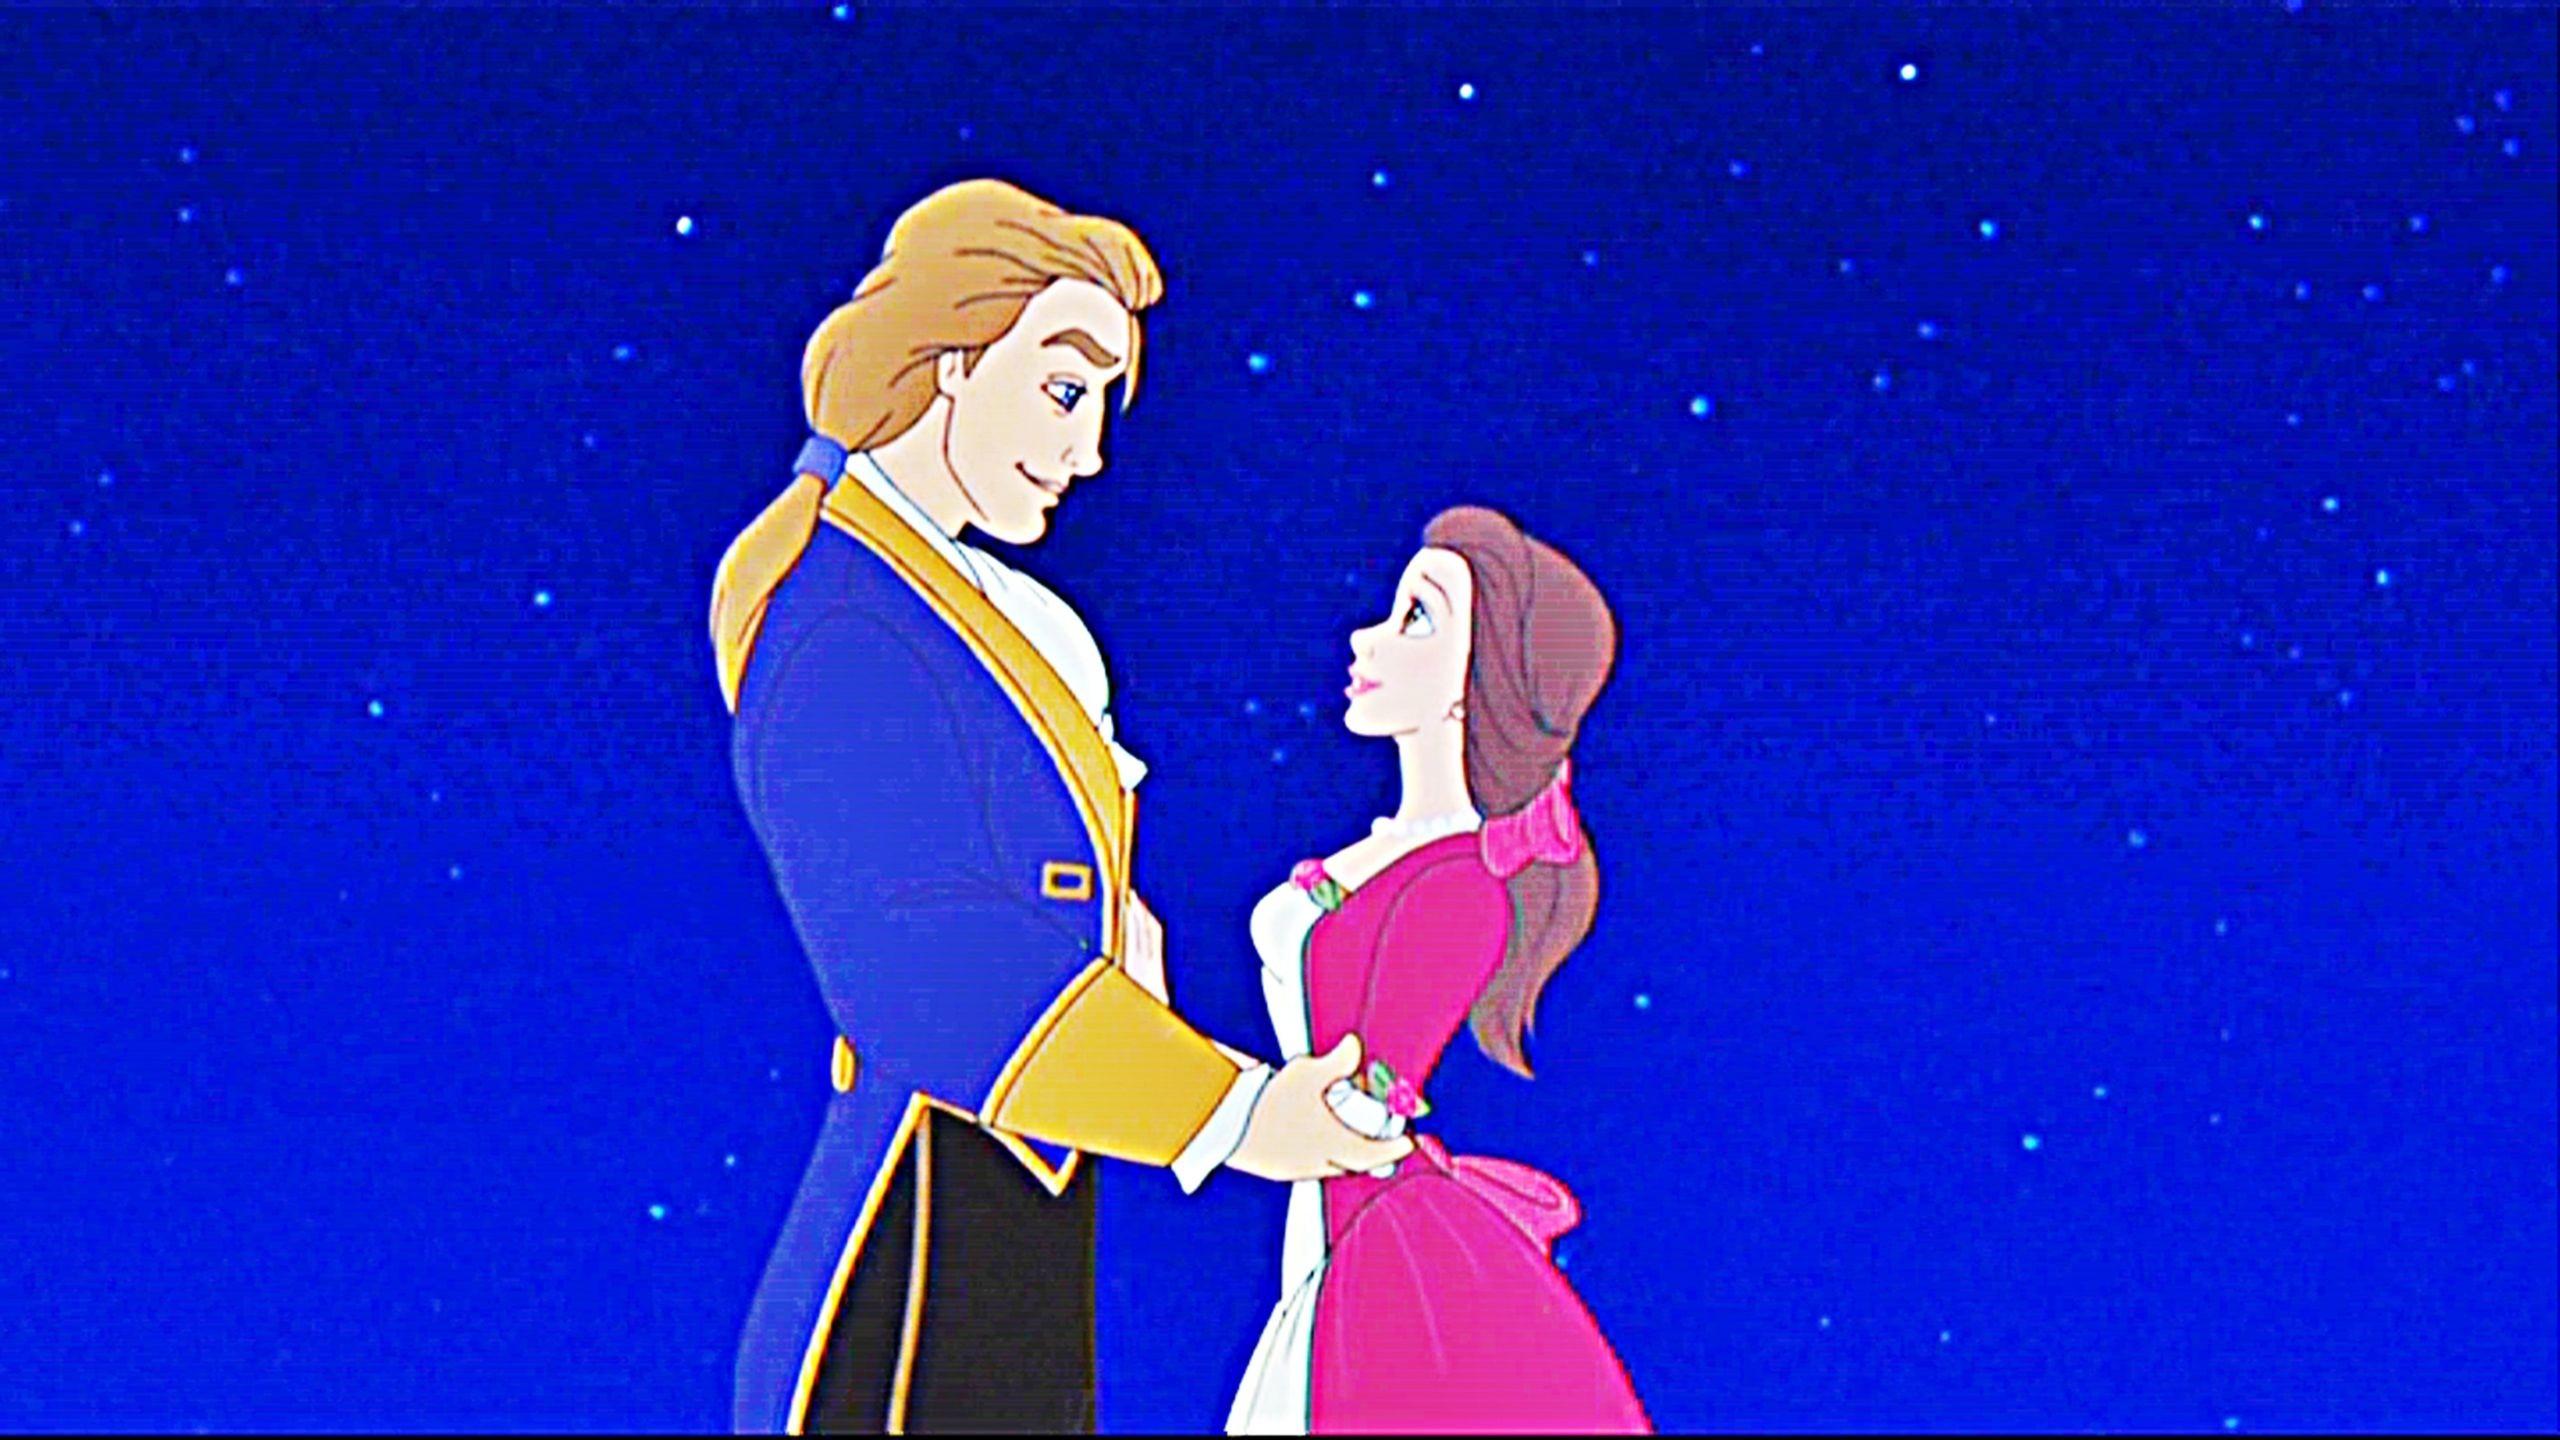 Res: 2560x1440, Princess Belle and Prince Adam | Disney-Princess-Prince-Adam-Princess-